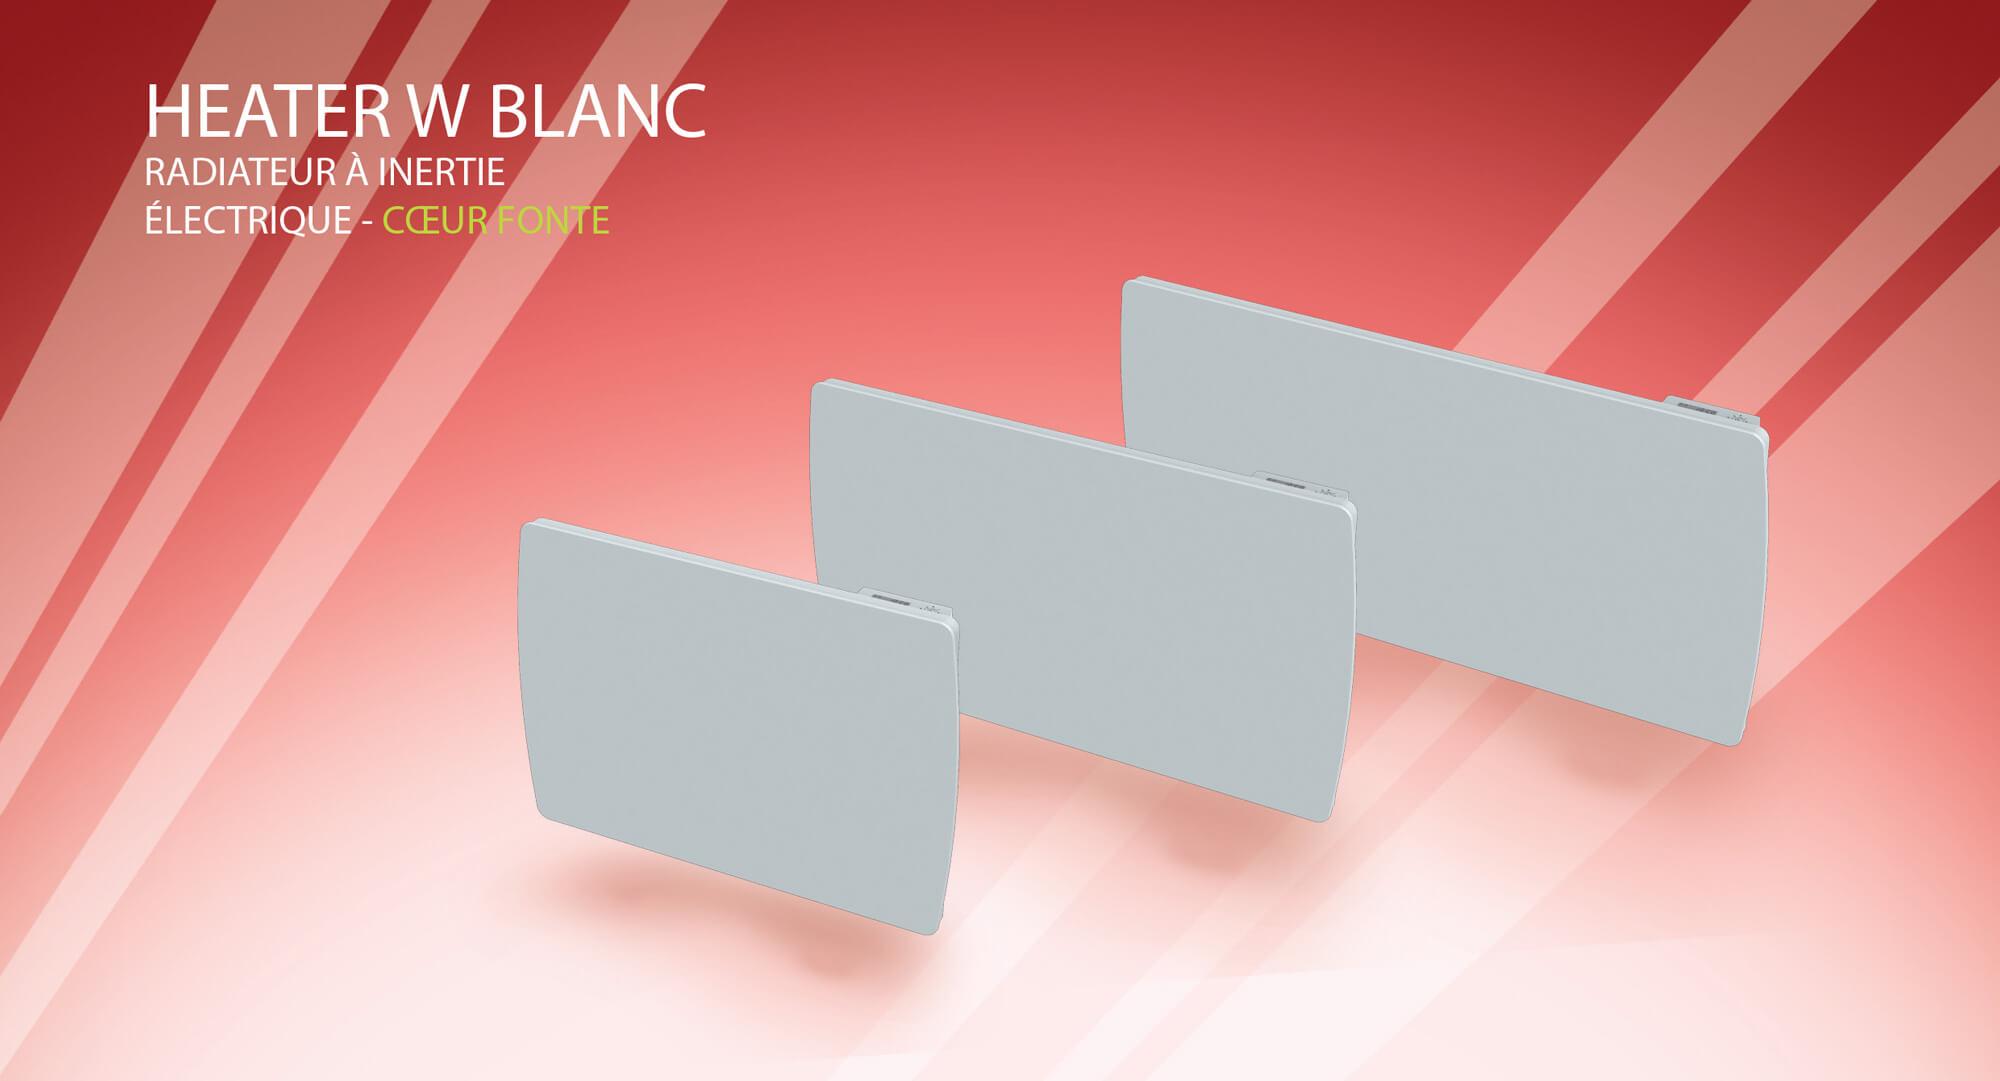 destockage carrera radiateur inertie verre blanc fire 1000 w pas cher achat vente radiateur. Black Bedroom Furniture Sets. Home Design Ideas